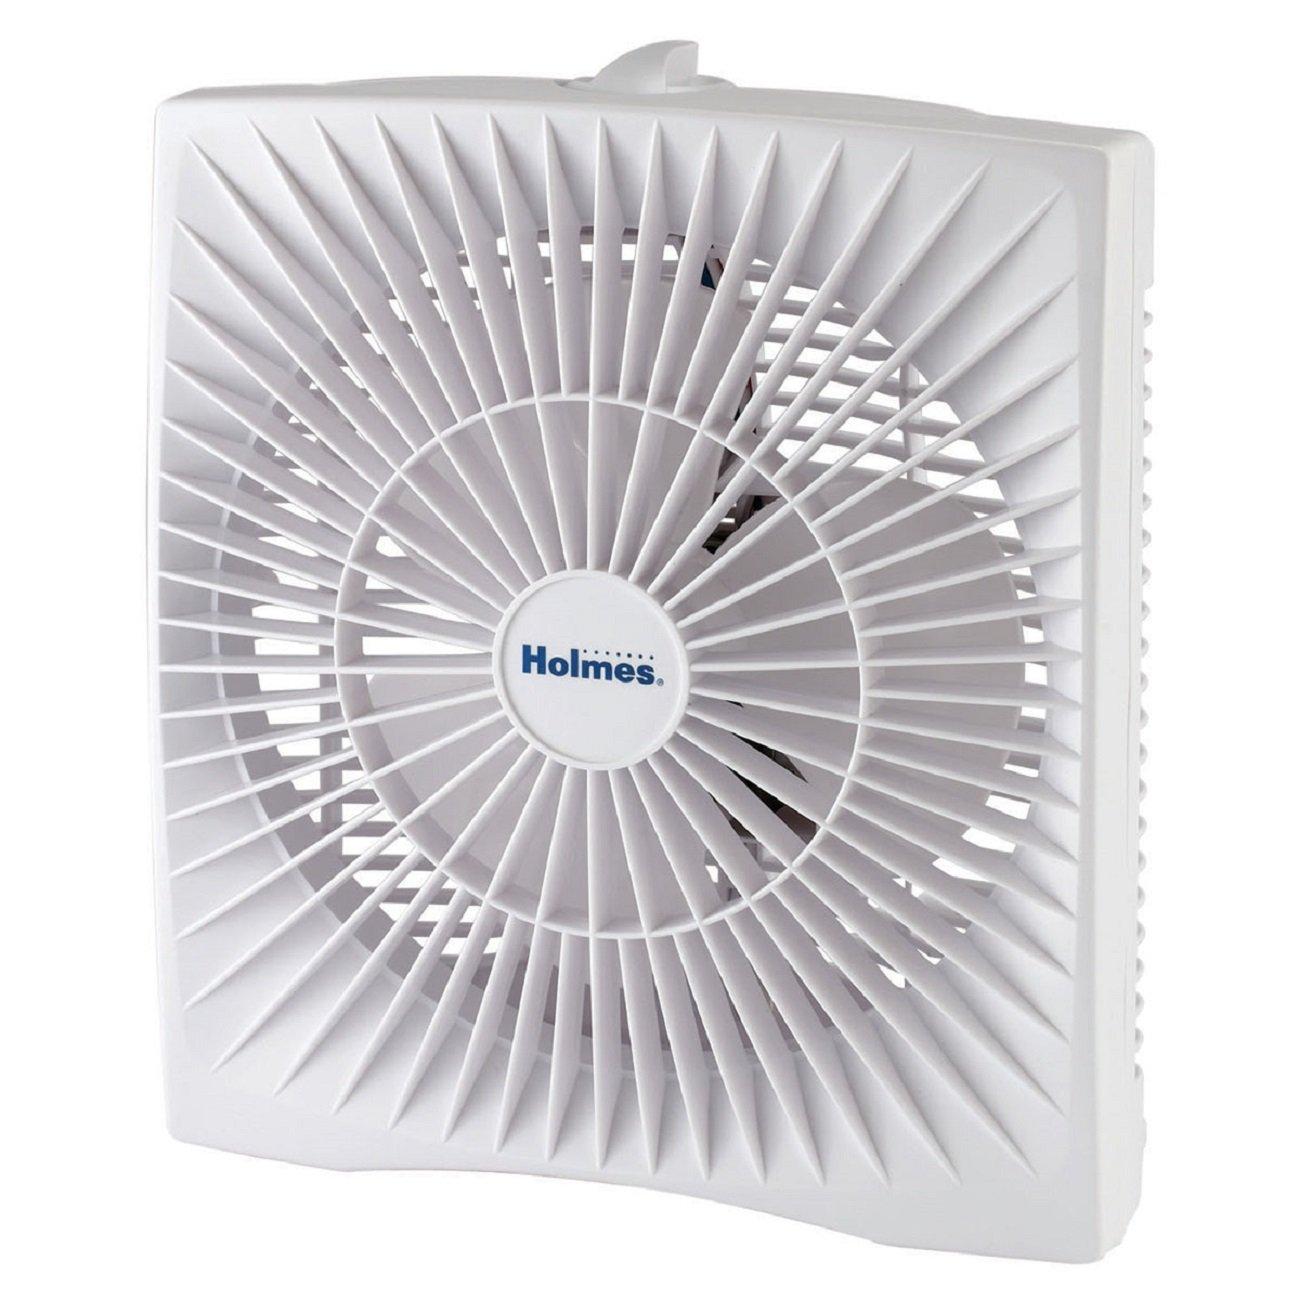 Holmes 10-inch Personal Size Box Fan, HABF120W